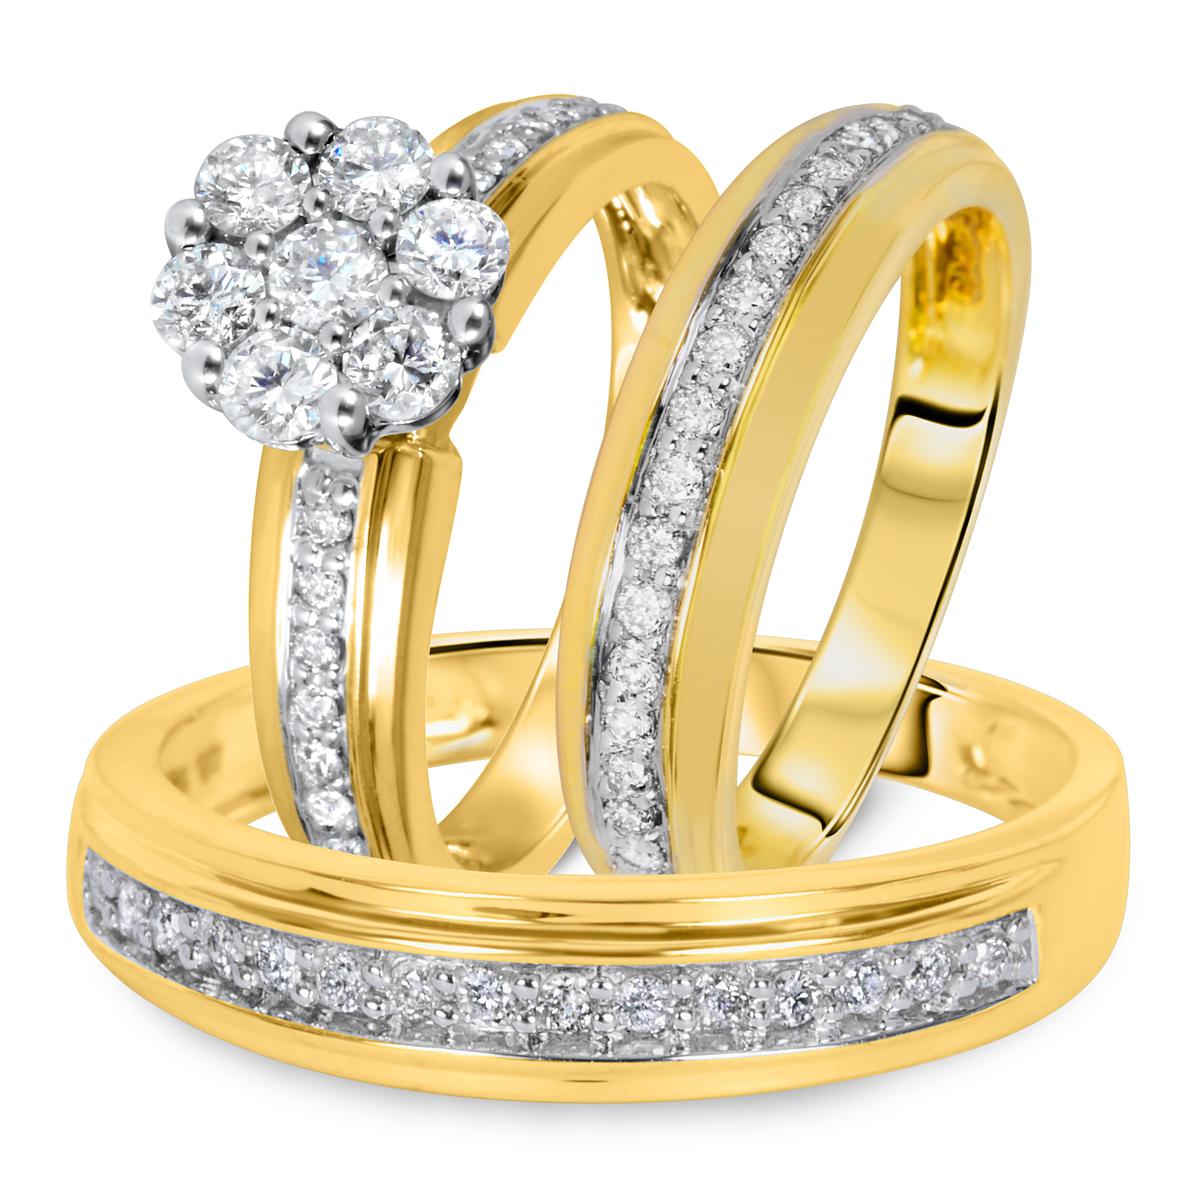 1 1/7 CT. T.W. Diamond Ladies Engagement Ring, Wedding Band, Men's Wedding Band